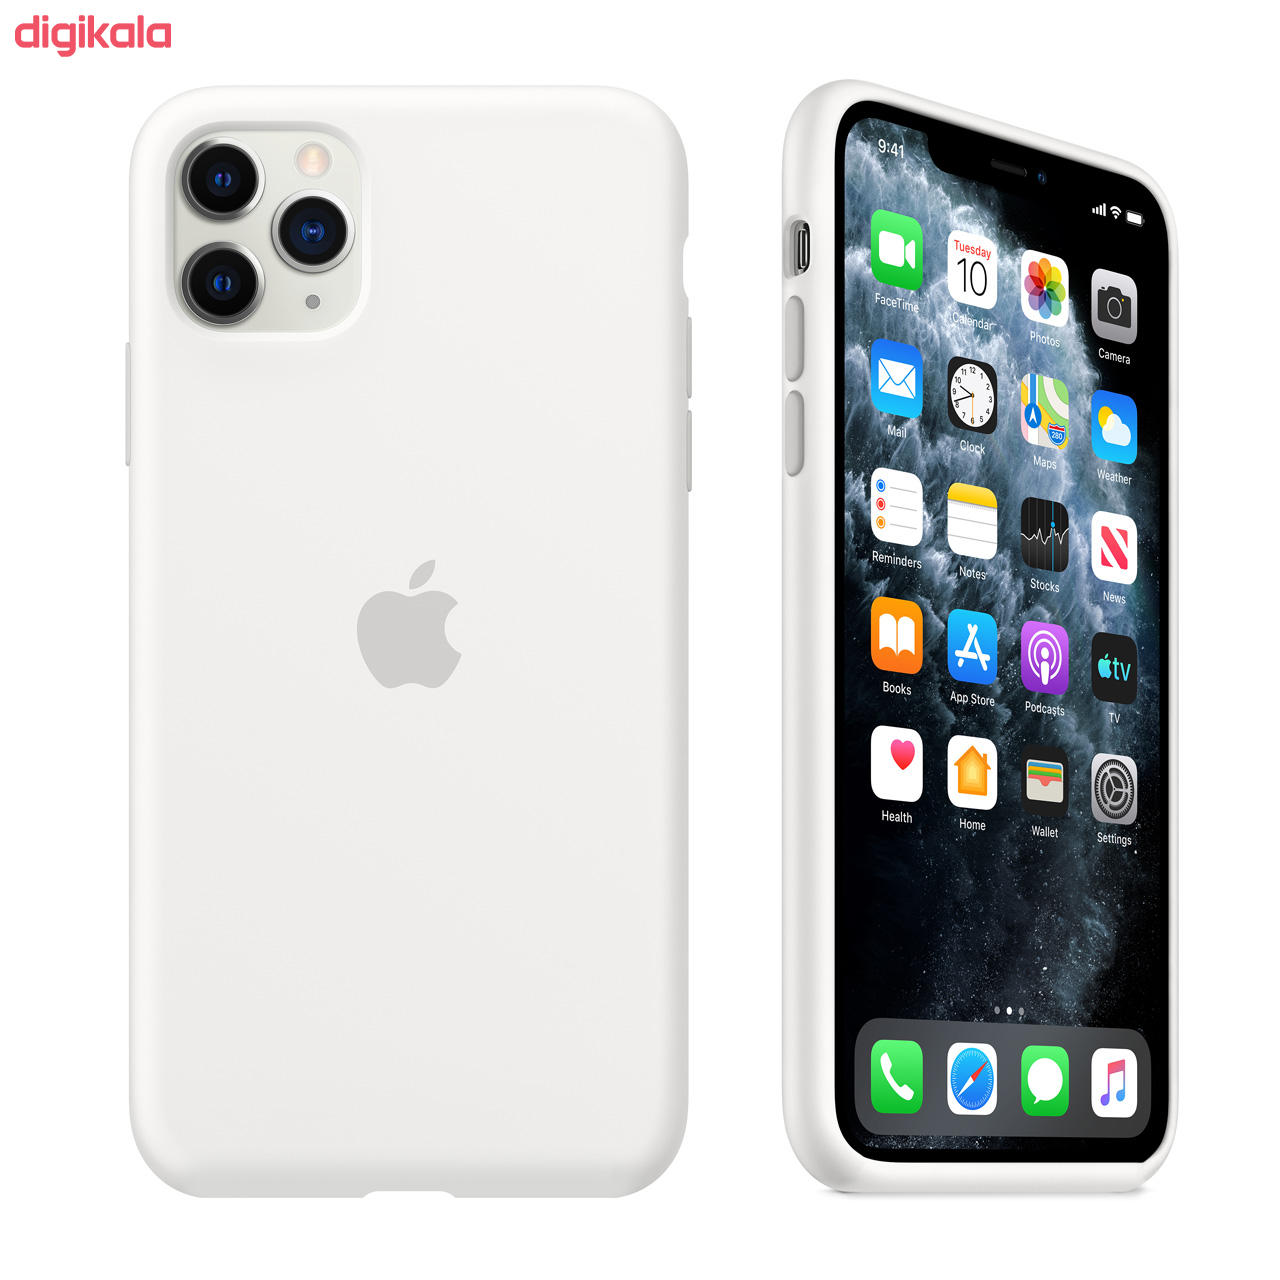 کاور وی کیس مدل Si01 مناسب برای گوشی موبایل اپل iPhone 11 Pro Max main 1 1